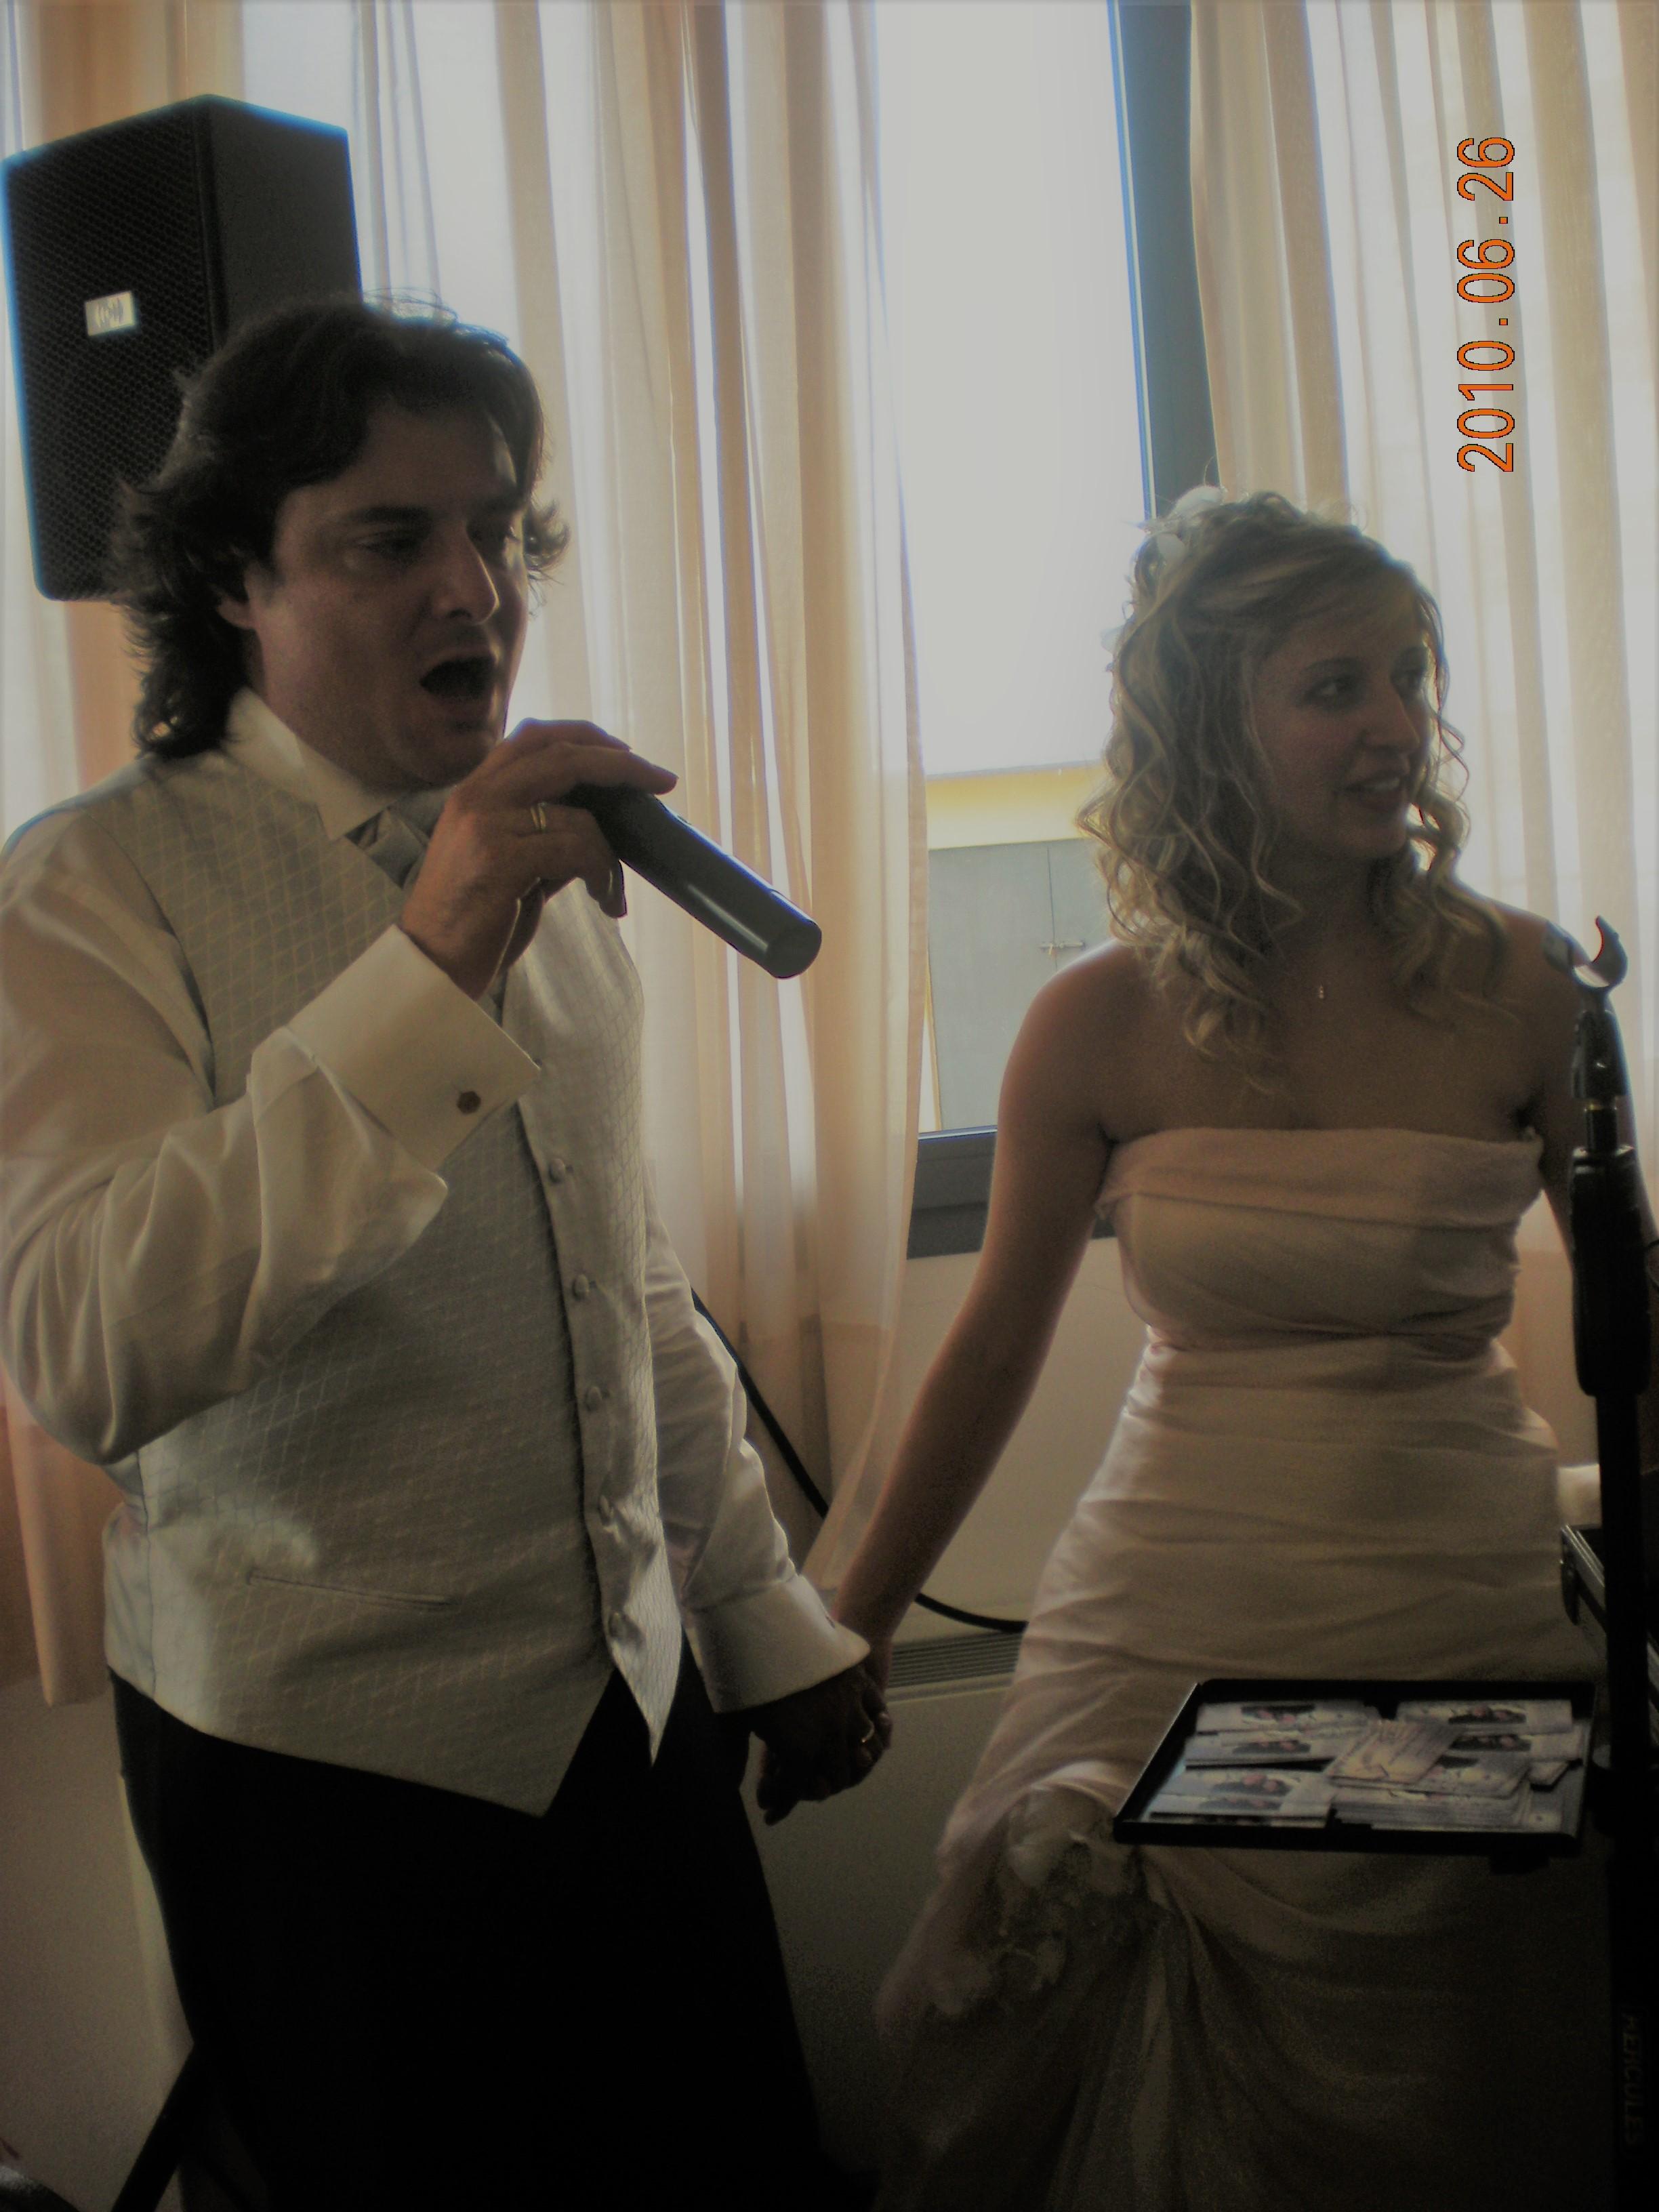 Francesco e Rosanna - 26.06.2010 - 033.JPG